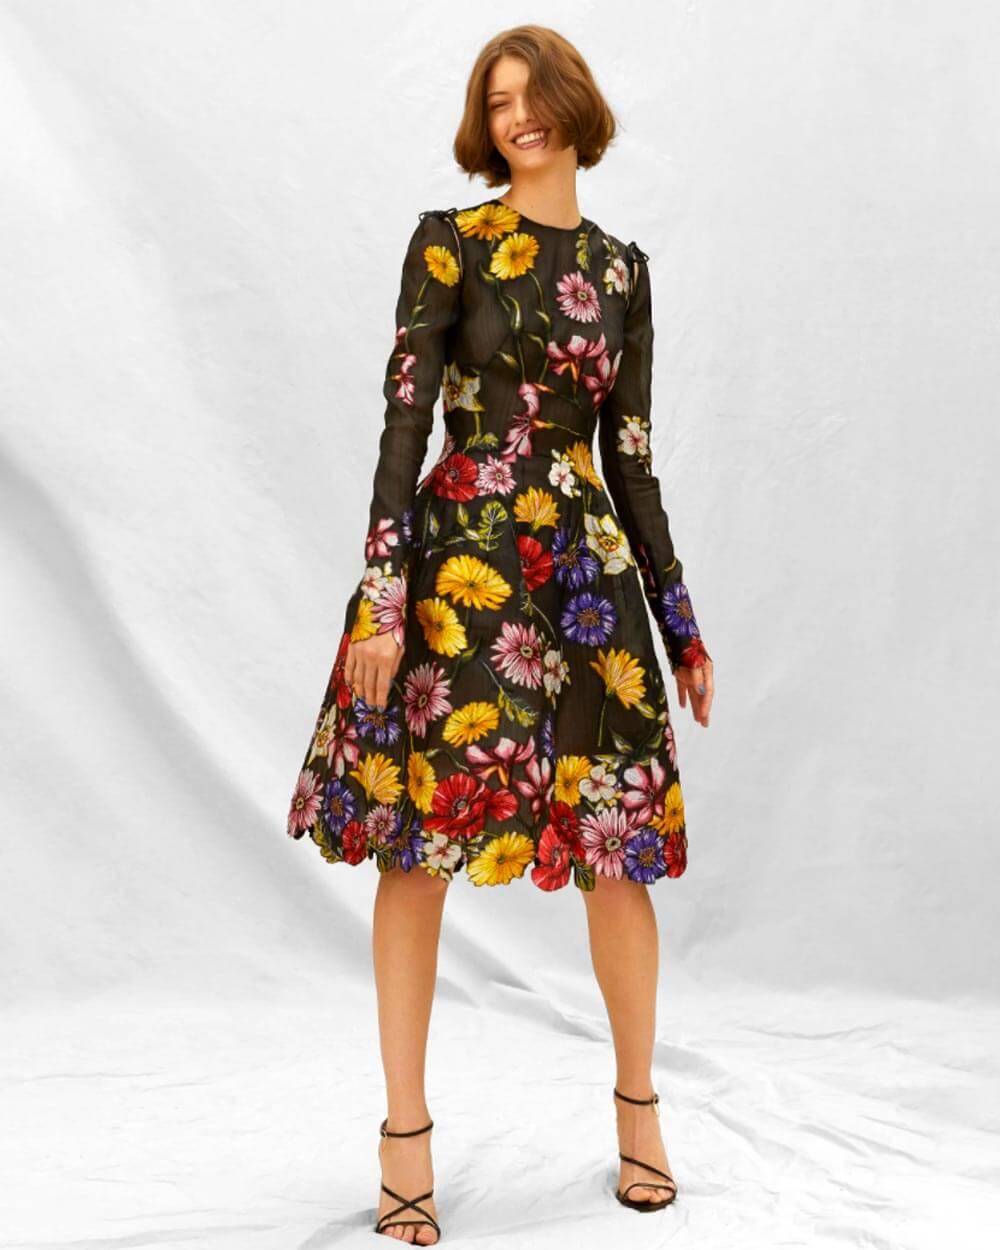 Fantasy Floral current fashion trends 2021